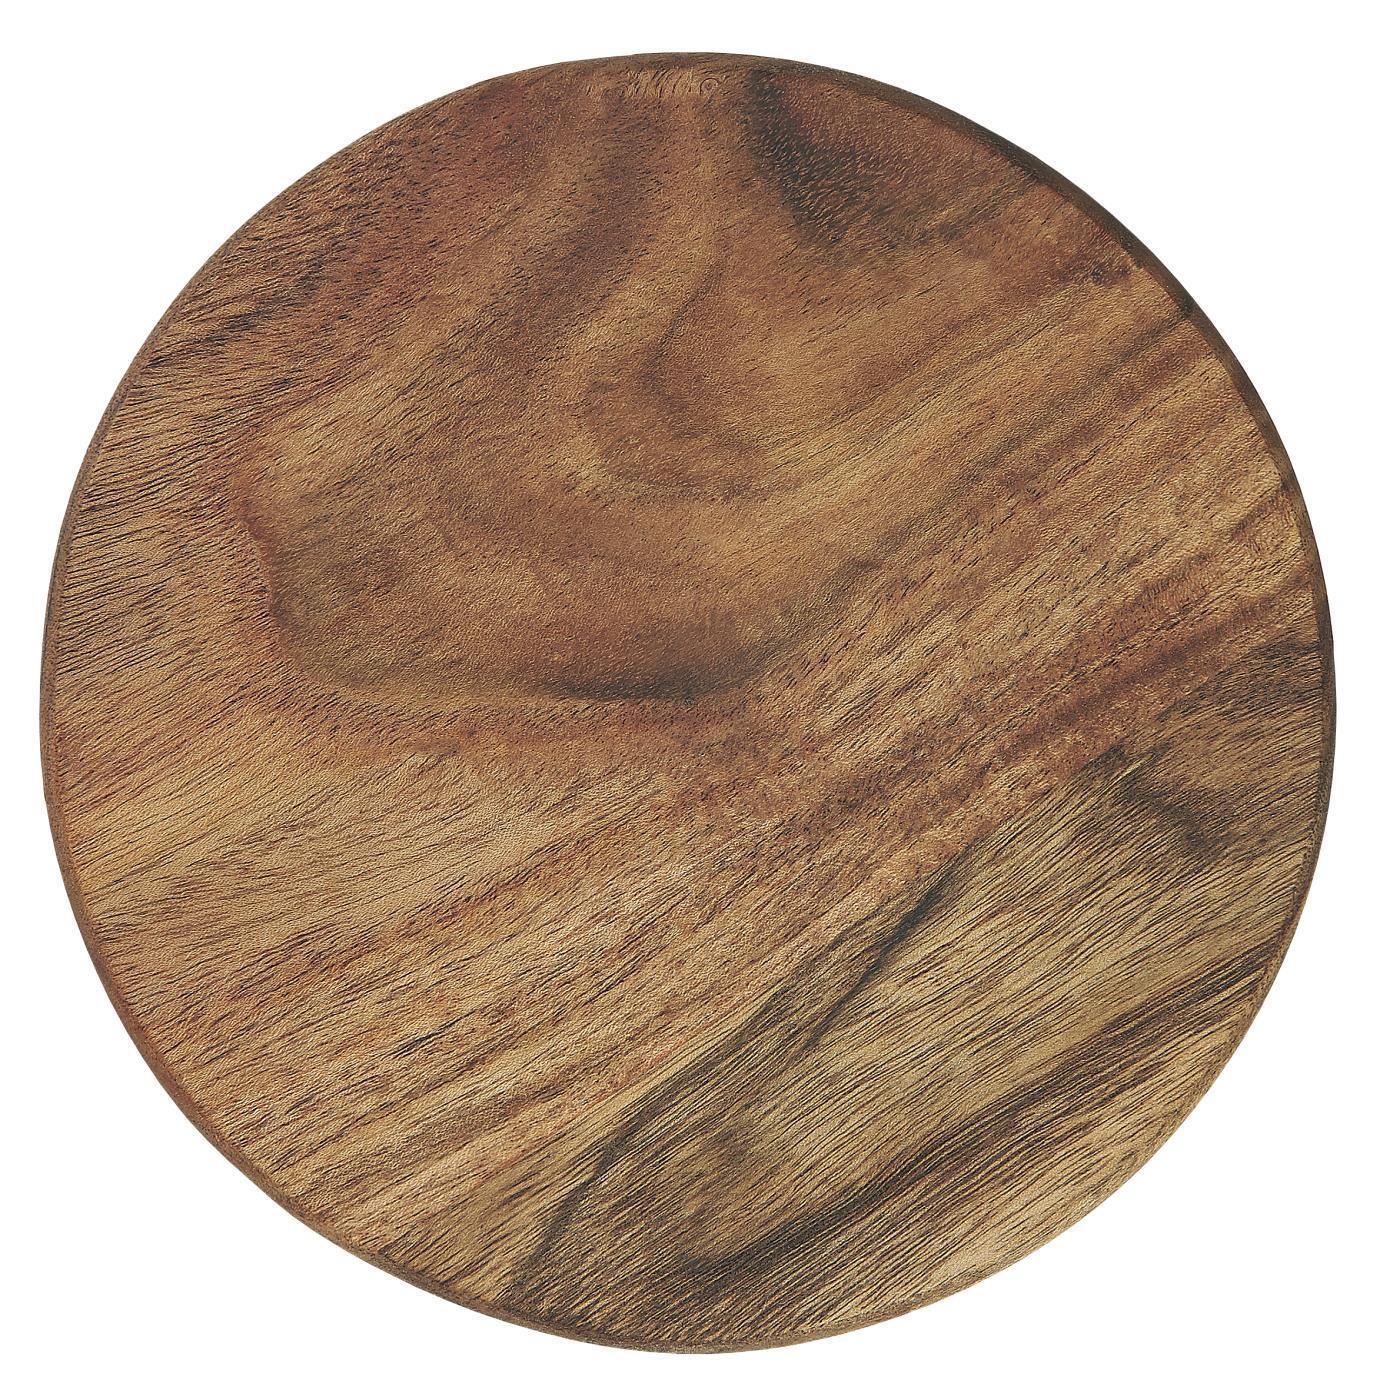 IB LAURSEN Kulaté krájecí prkénko Round Accacia Wood, hnědá barva, dřevo